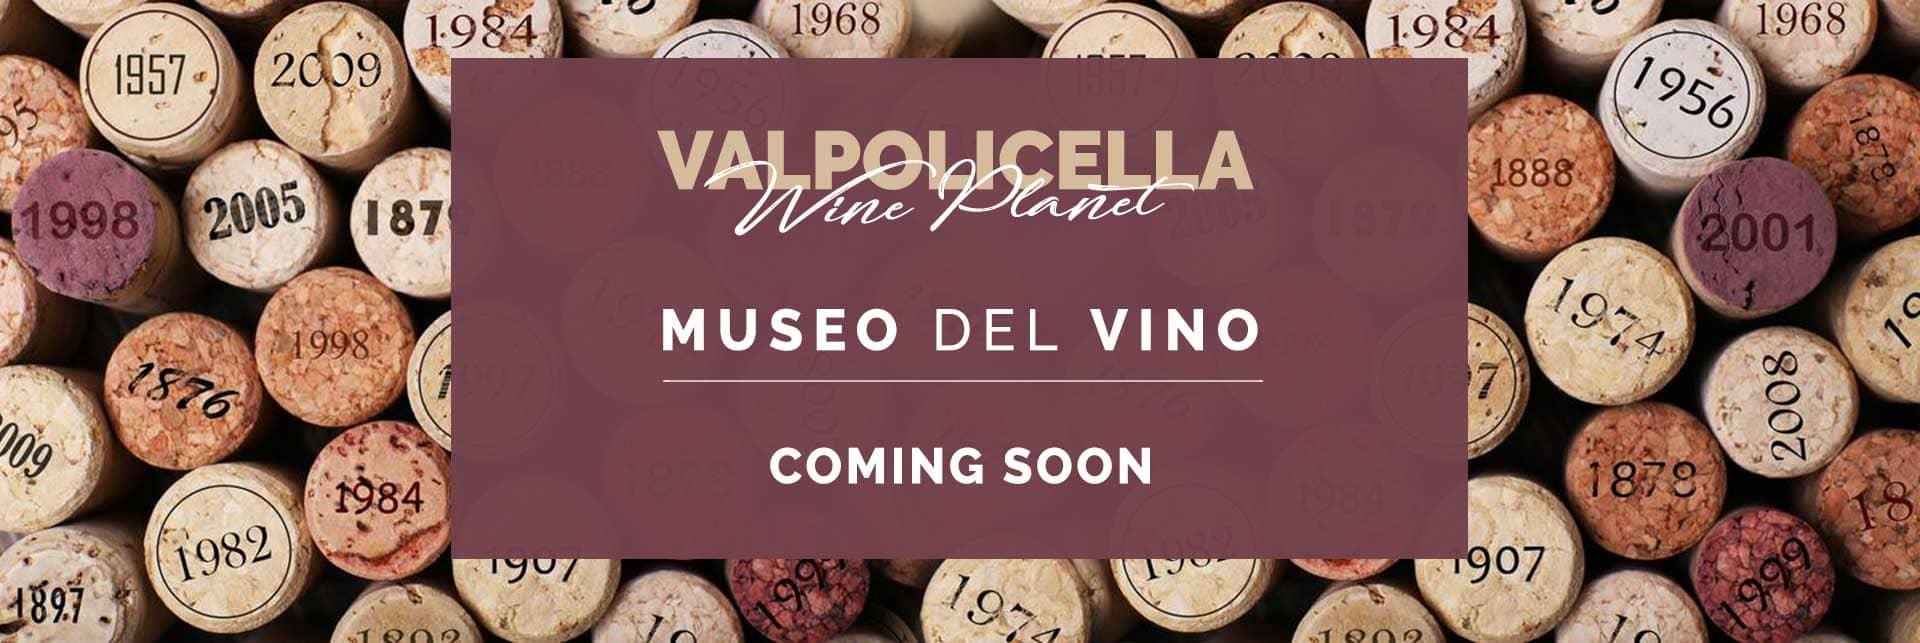 museo del vino consorzio valpolicella